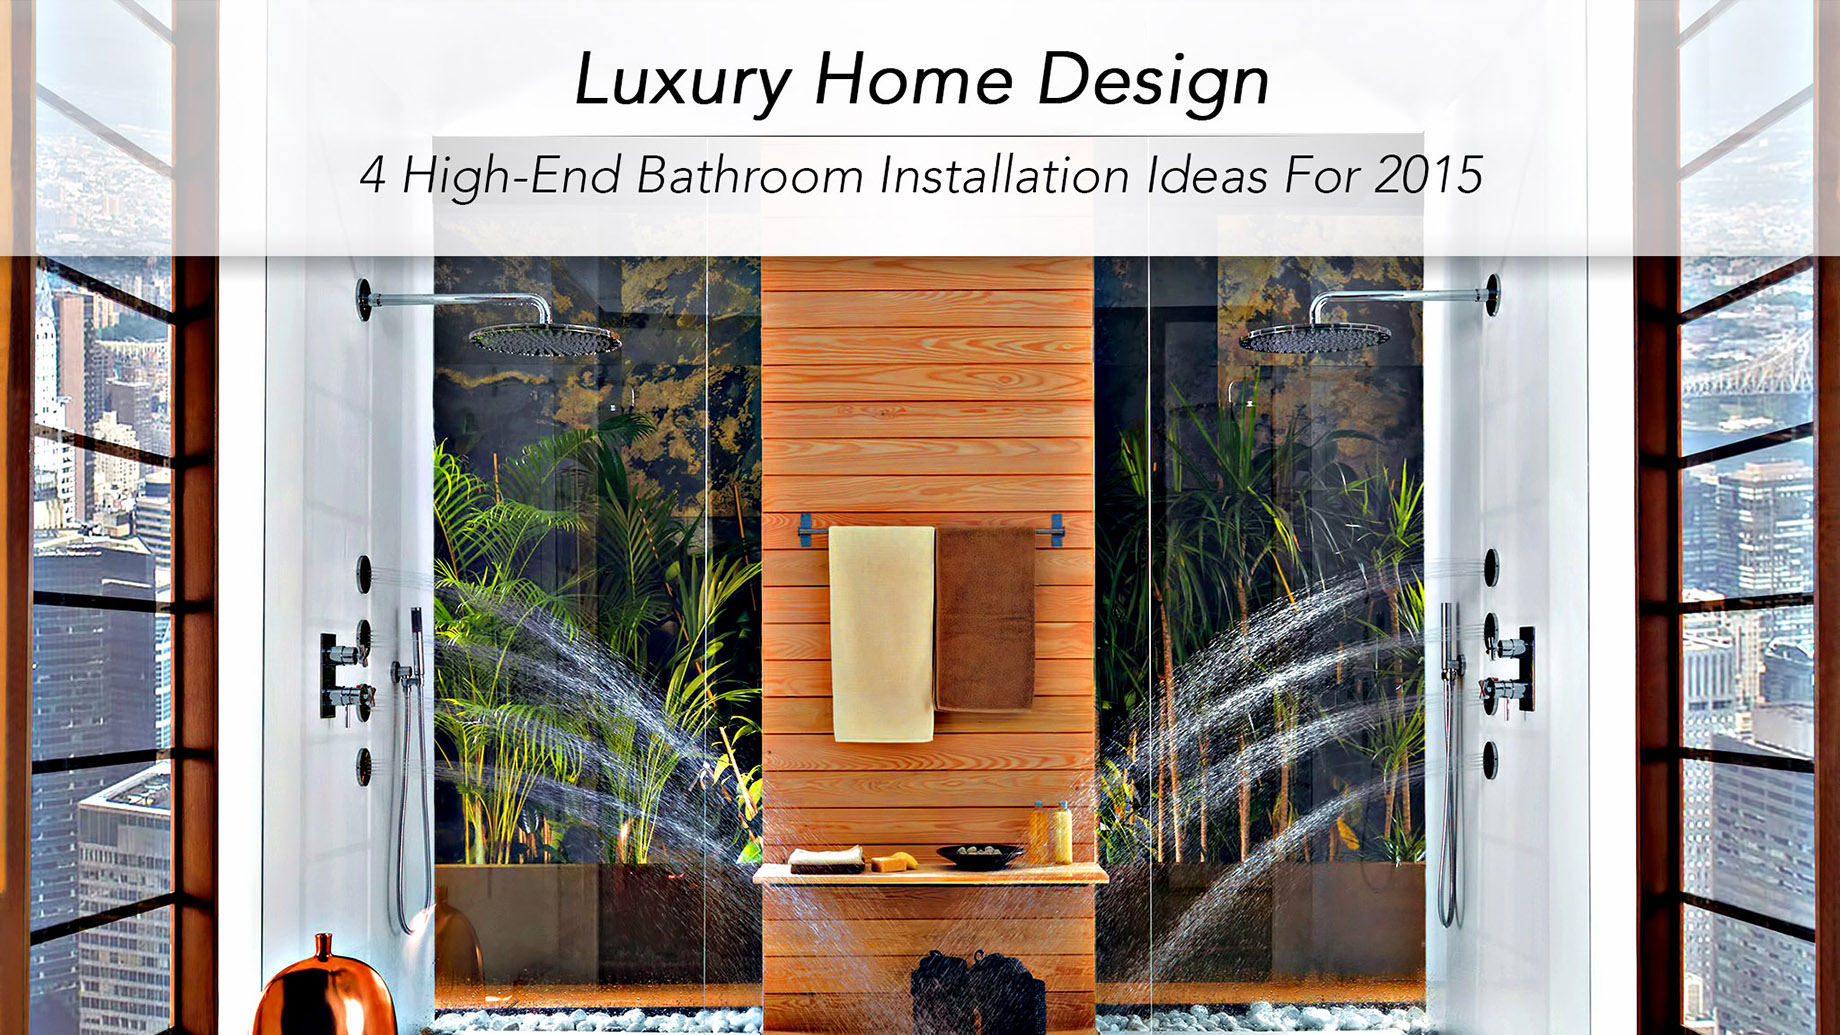 Luxury Home Design - 4 High-End Bathroom Installation Ideas